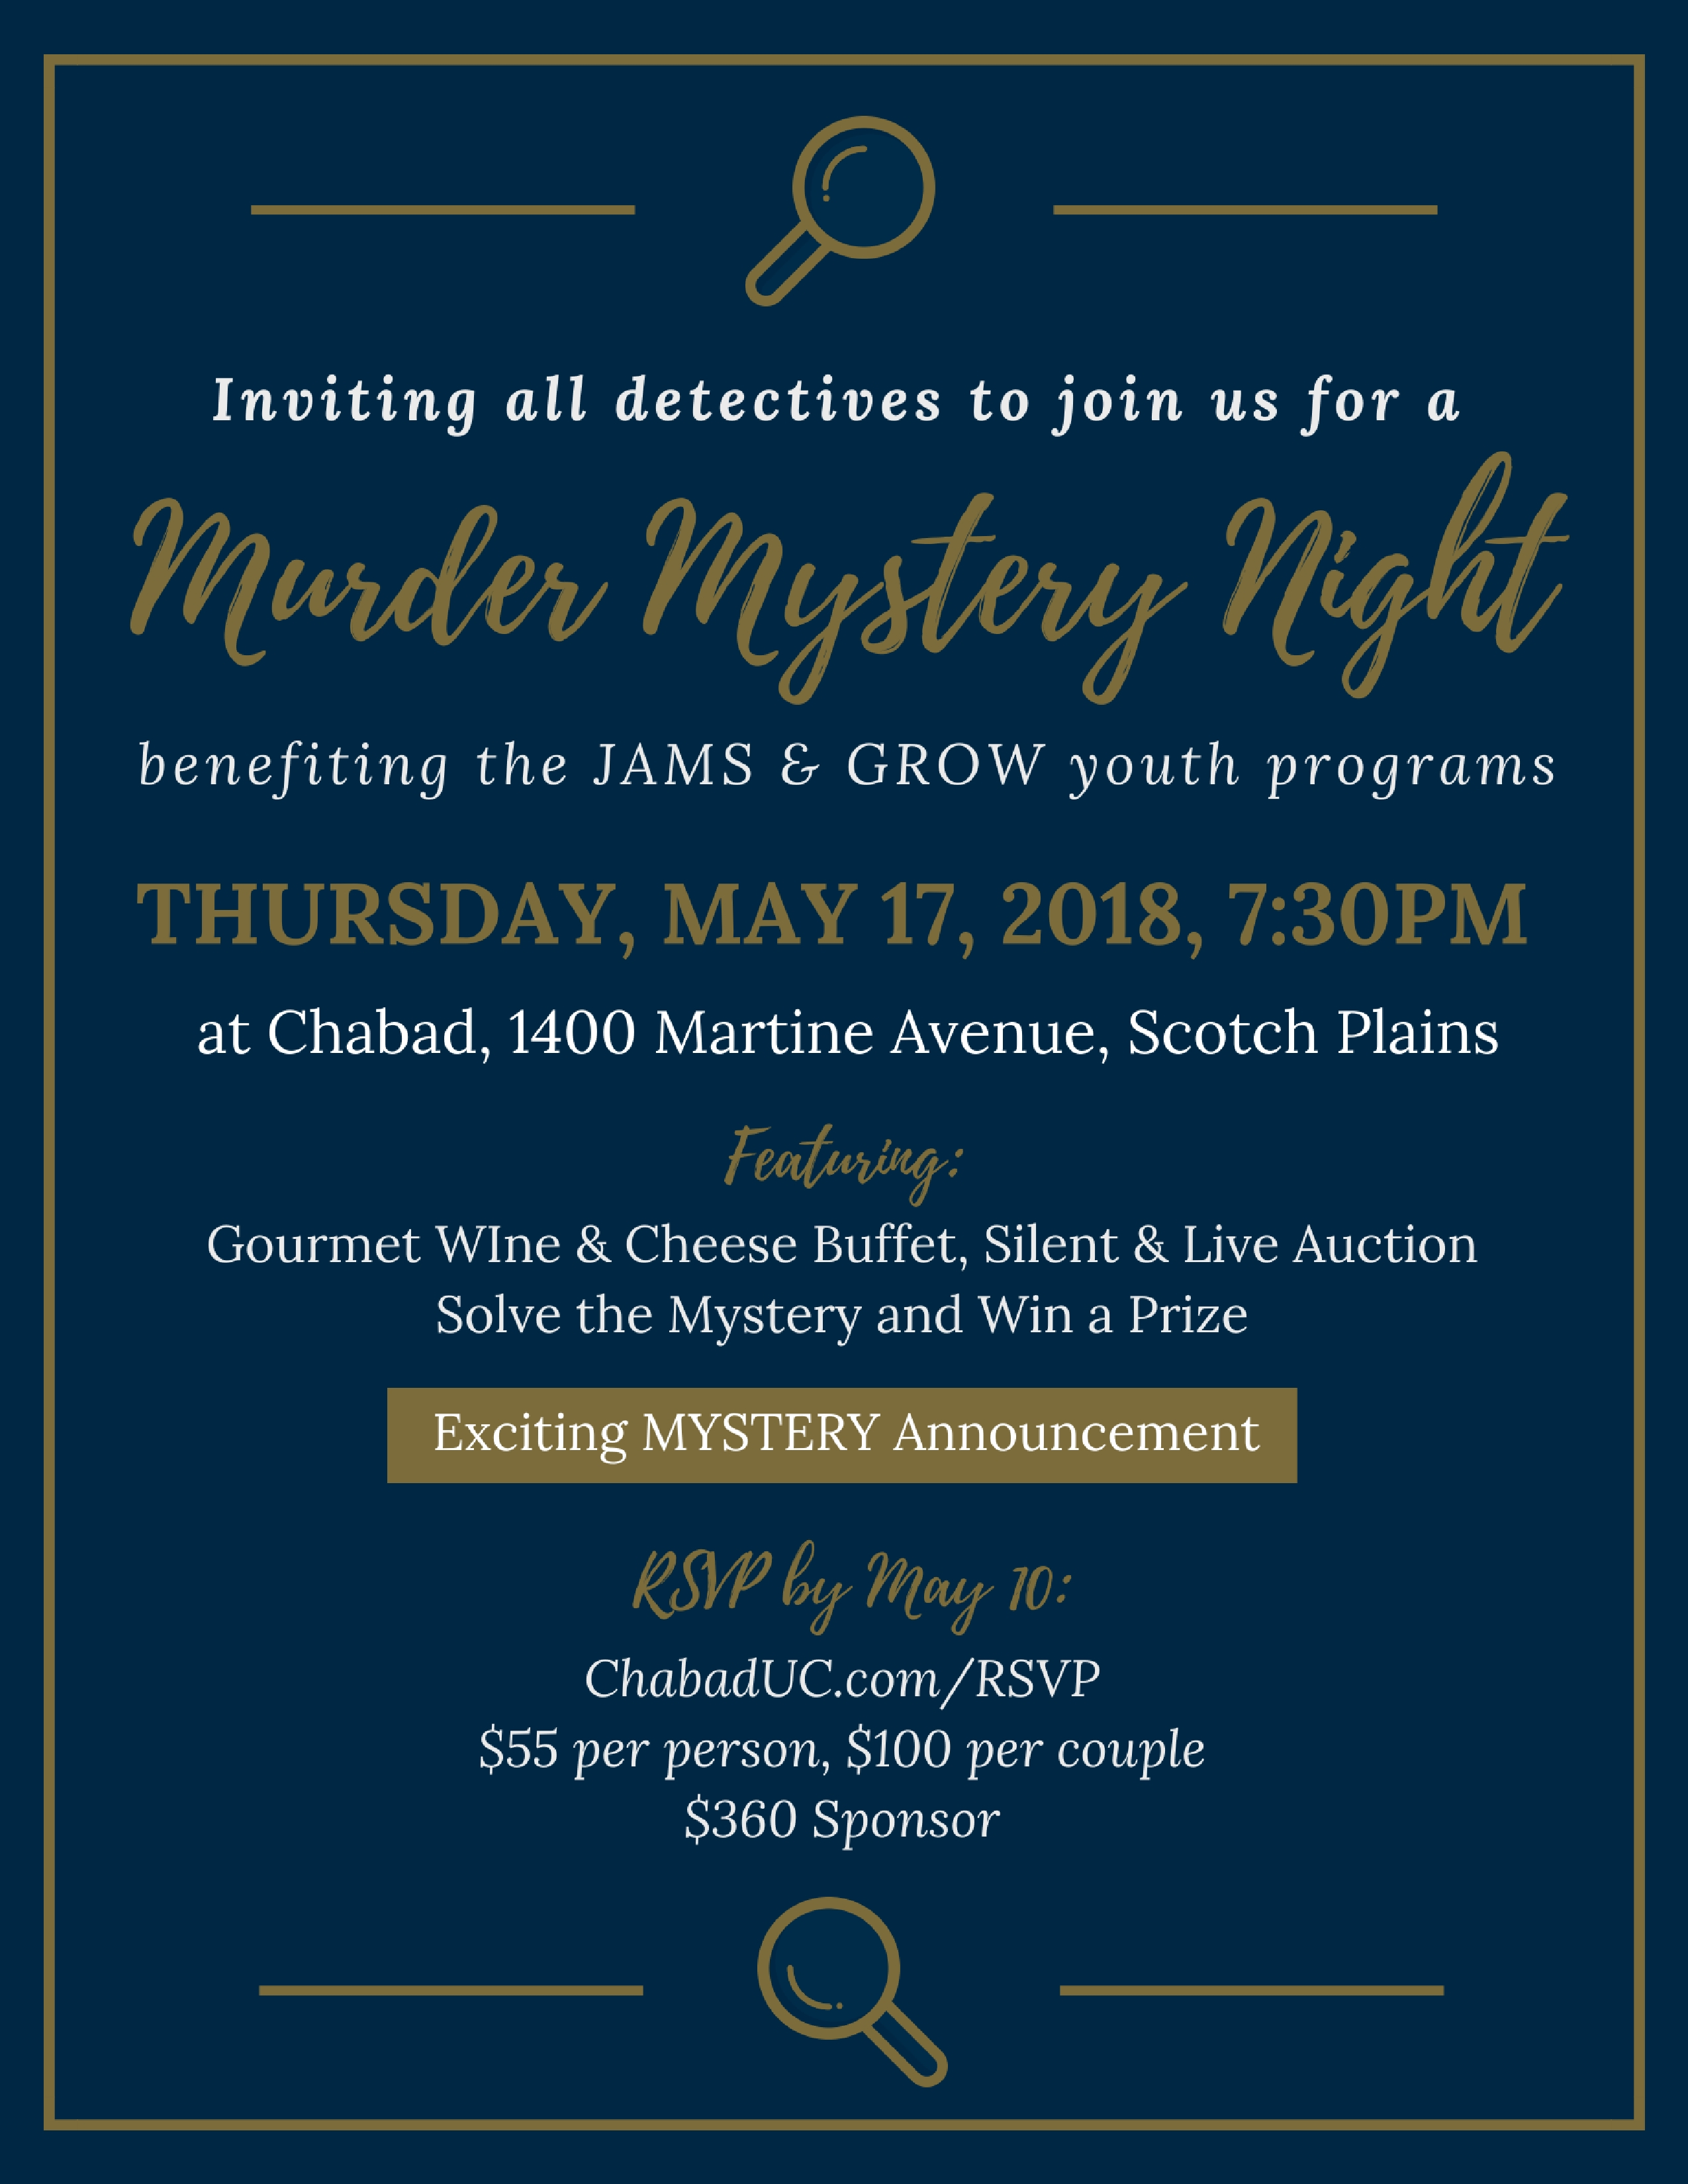 Mystery Night Flyer.jpg